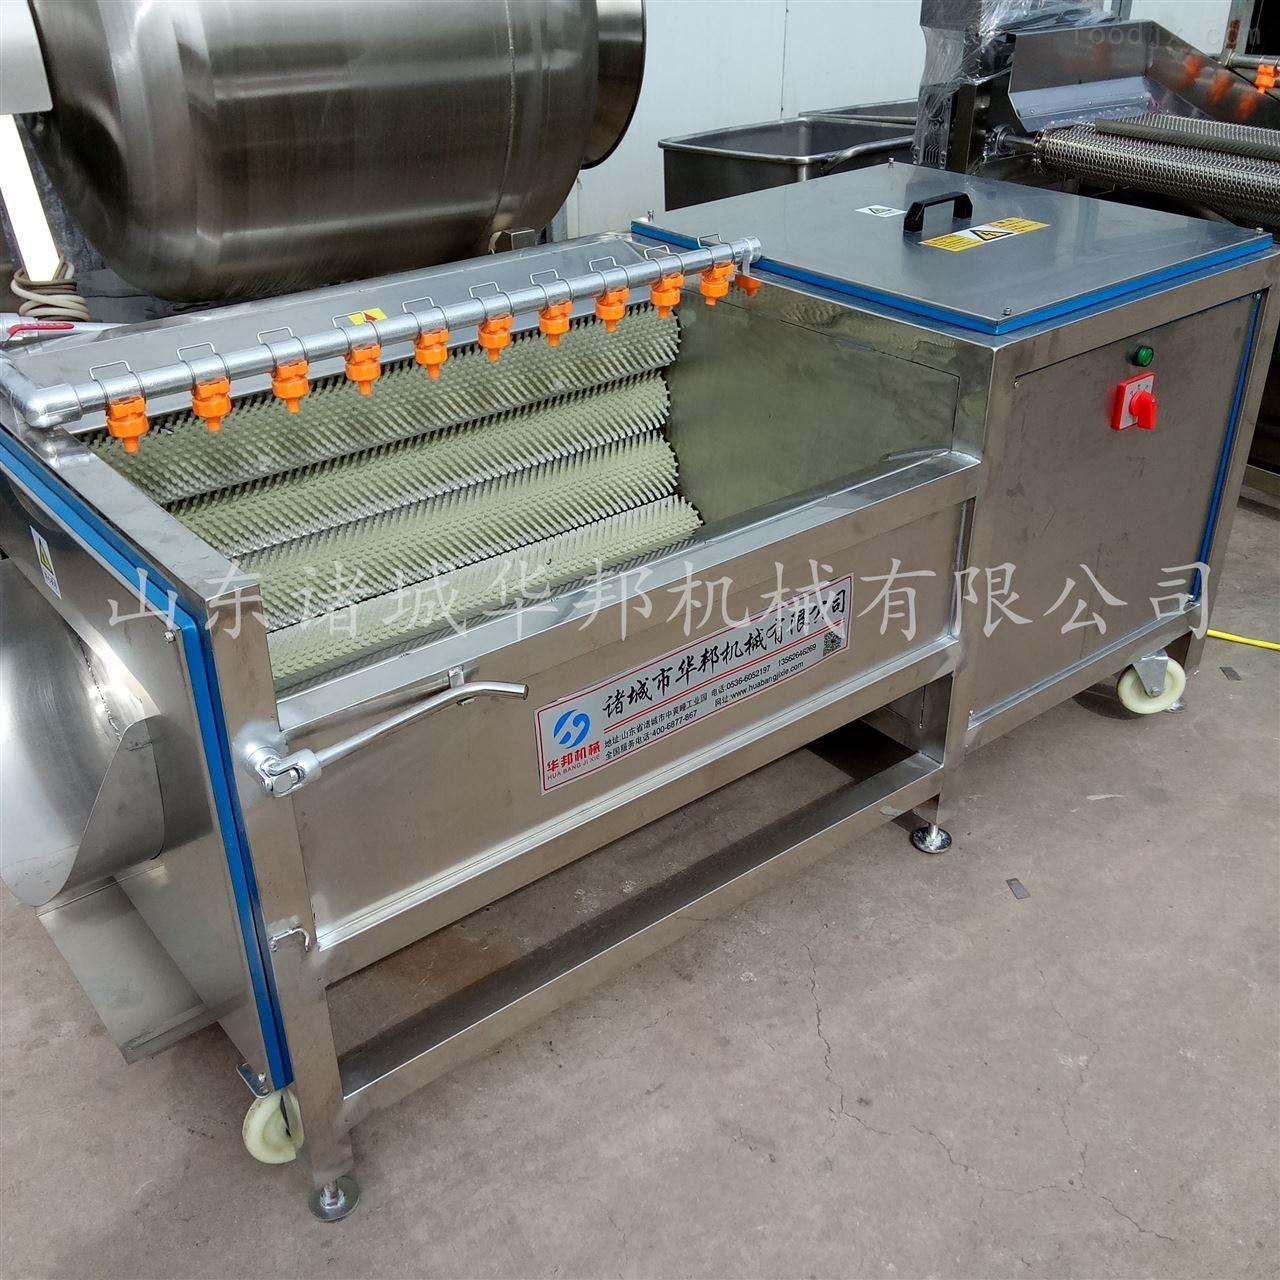 HB华邦牌蔬菜毛辊清洗机 流水线设备